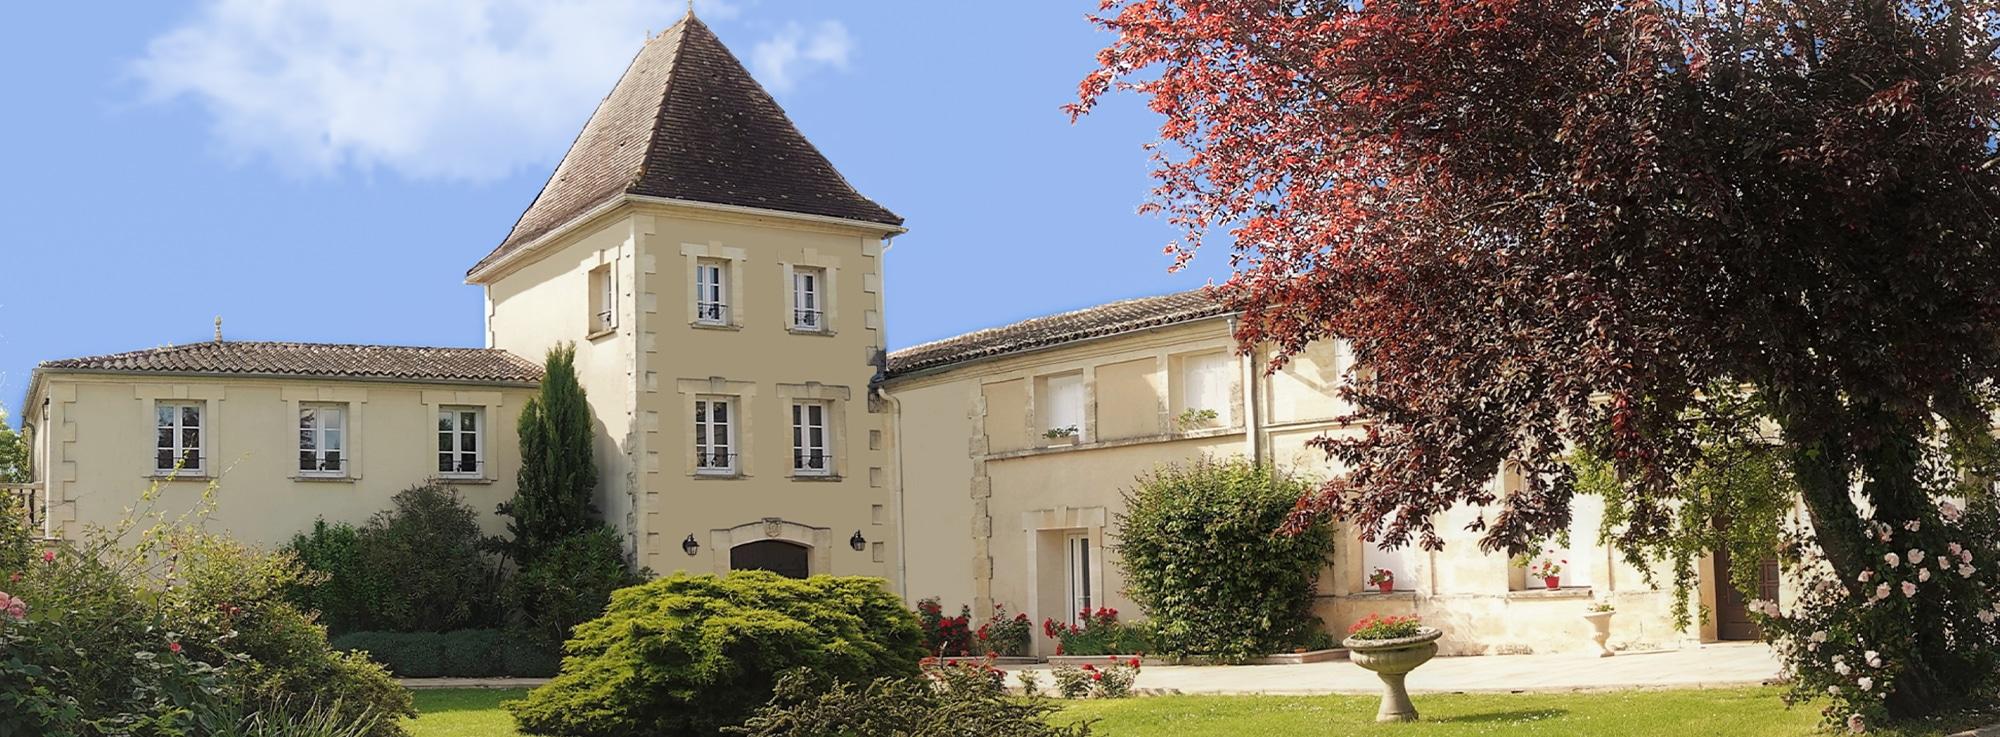 Chateau_ardoneau